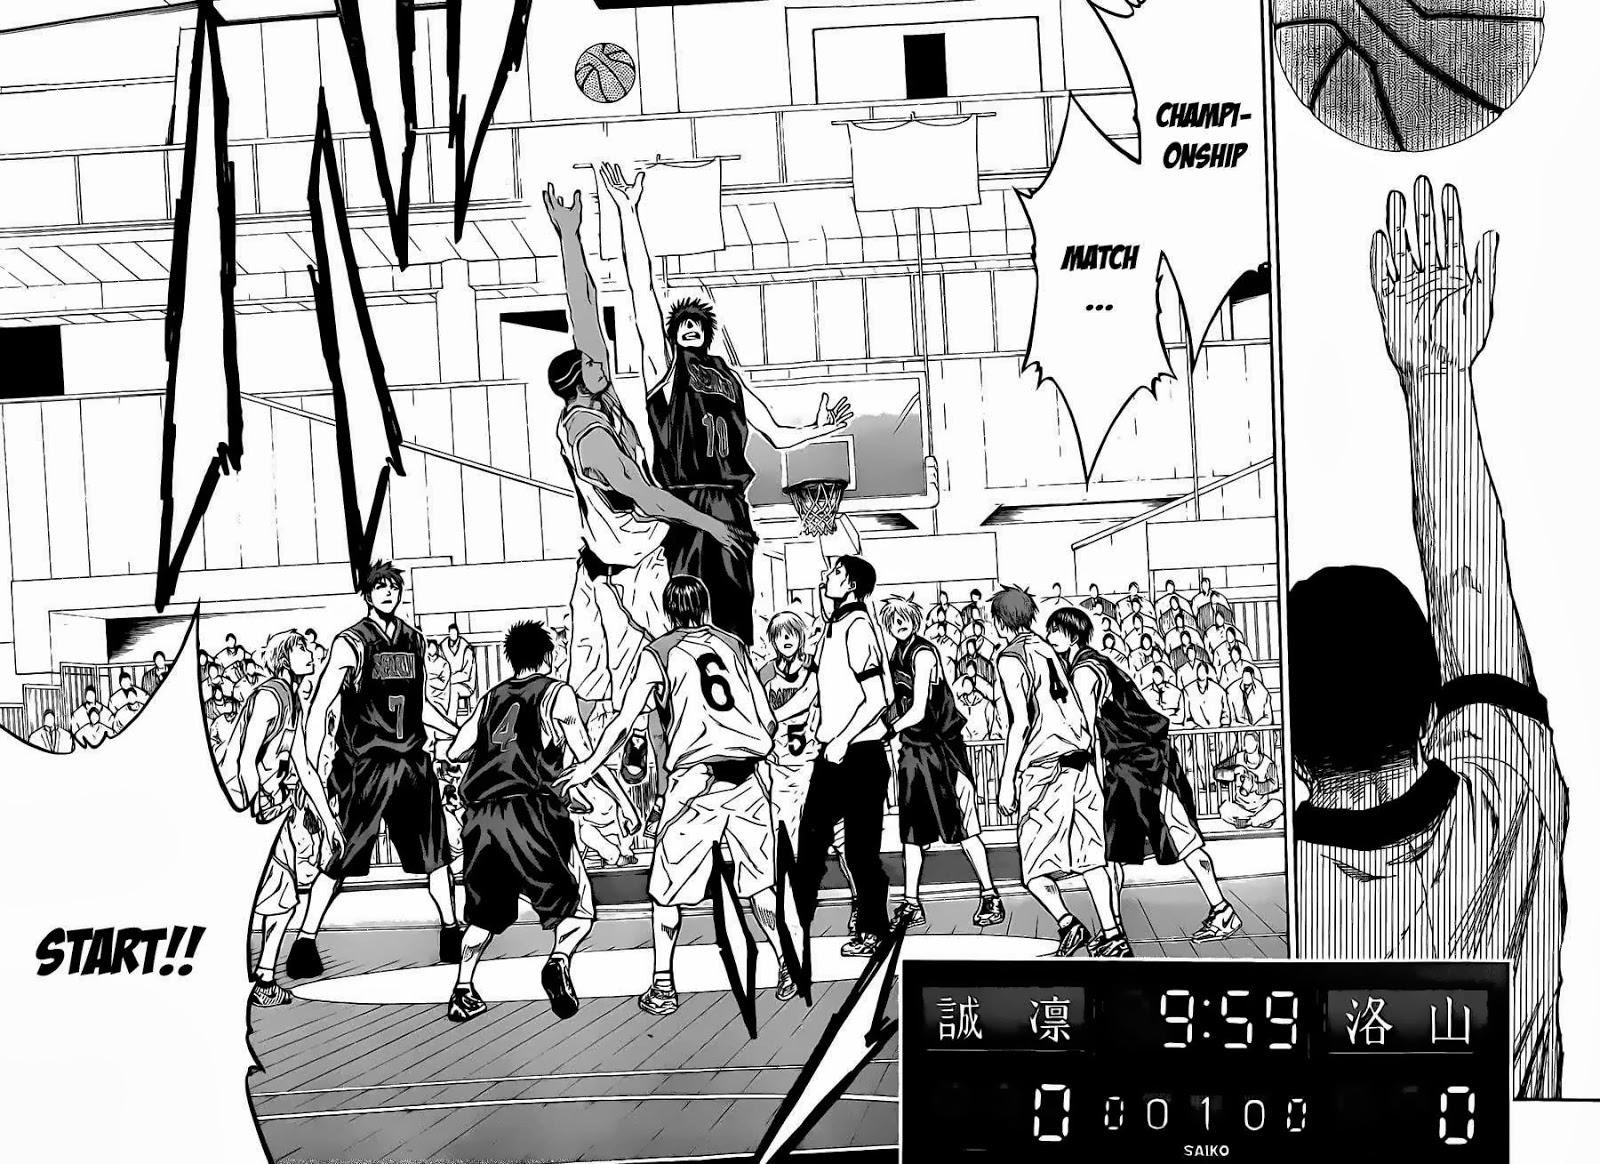 Kuroko no Basket Manga Chapter 232 - Image 06-07